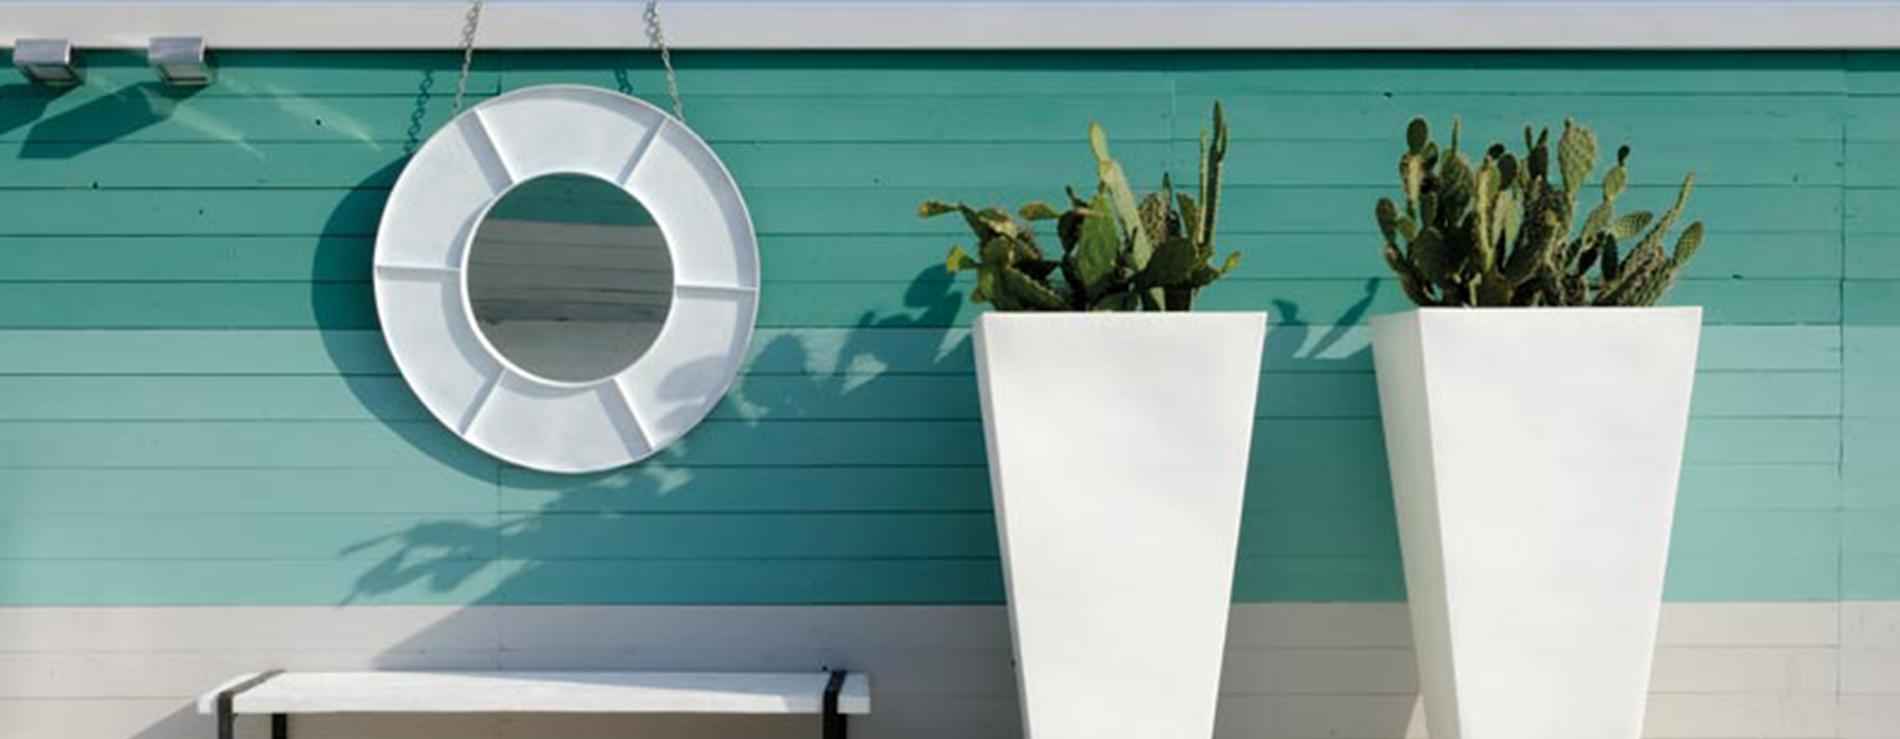 Vasi da interno leroy merlin portavasi da balcone prezzo - Leroy merlin illuminazione interno ...